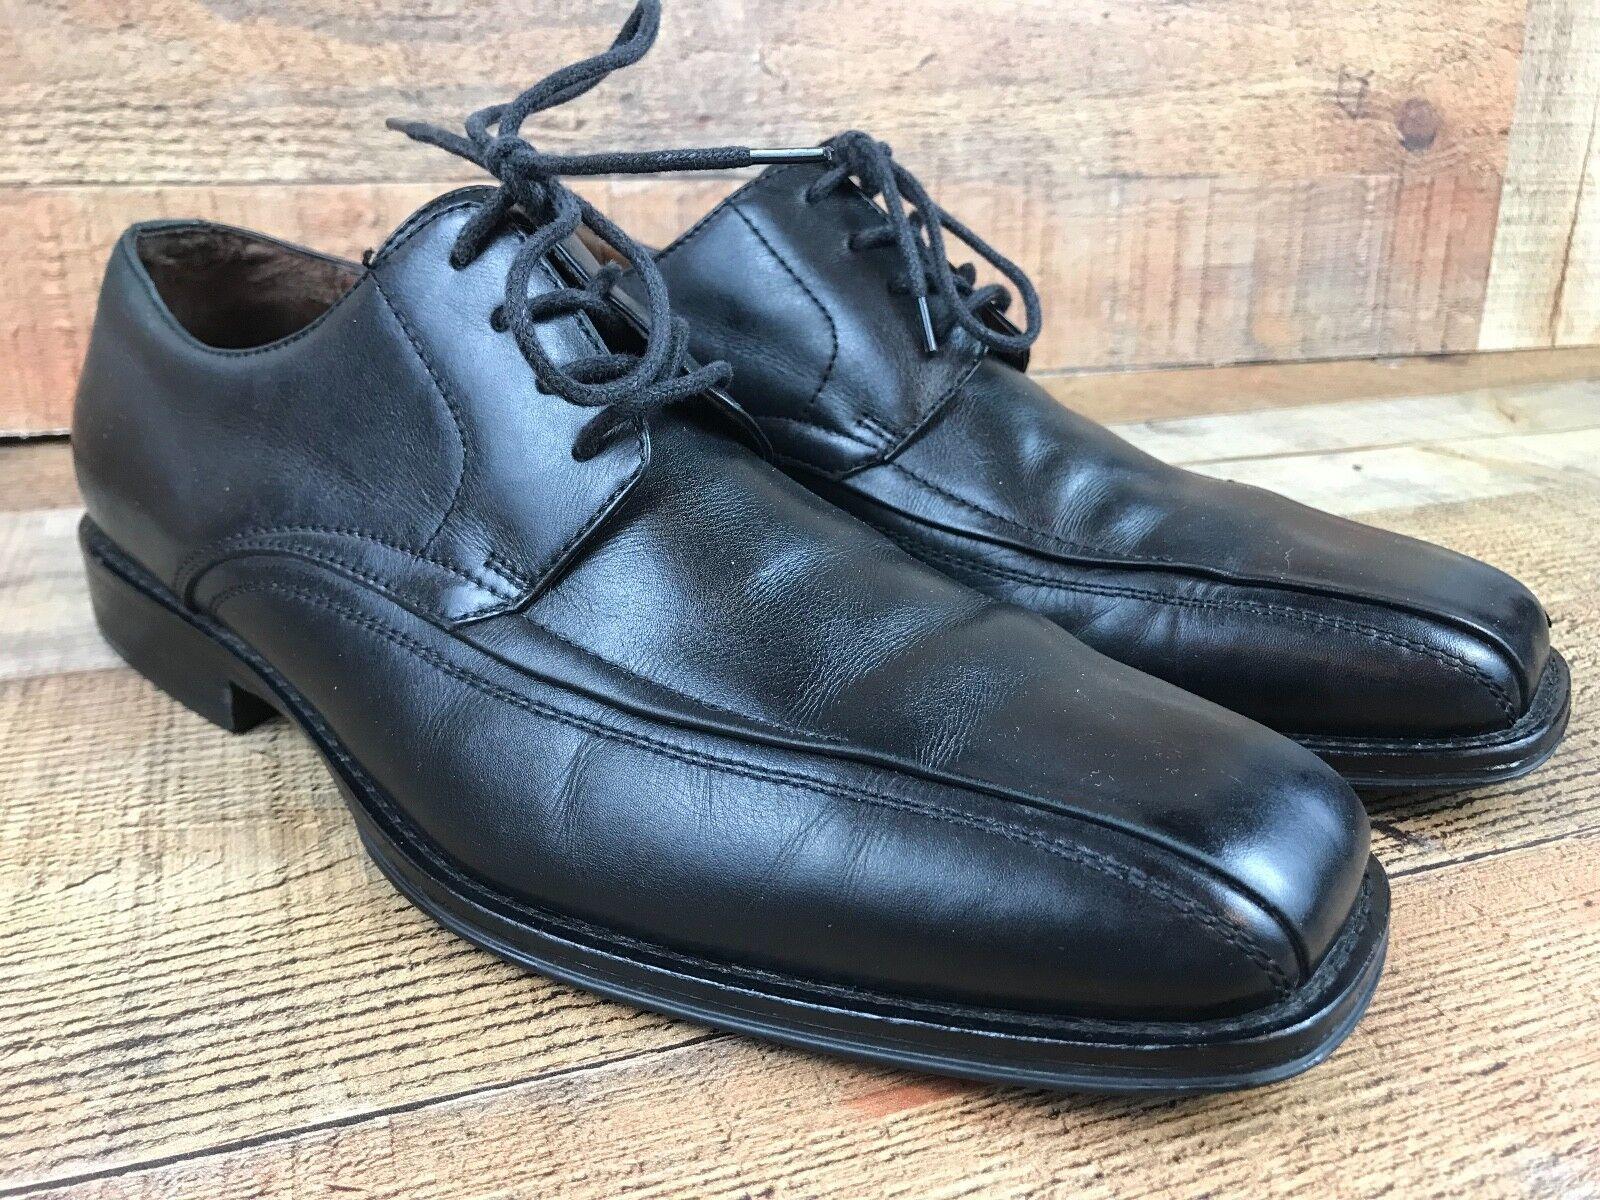 Johnston & Murphy Men's Black Oxford Moc Size Toe Dress Shoes - Size Moc 9.5 M db9d0a